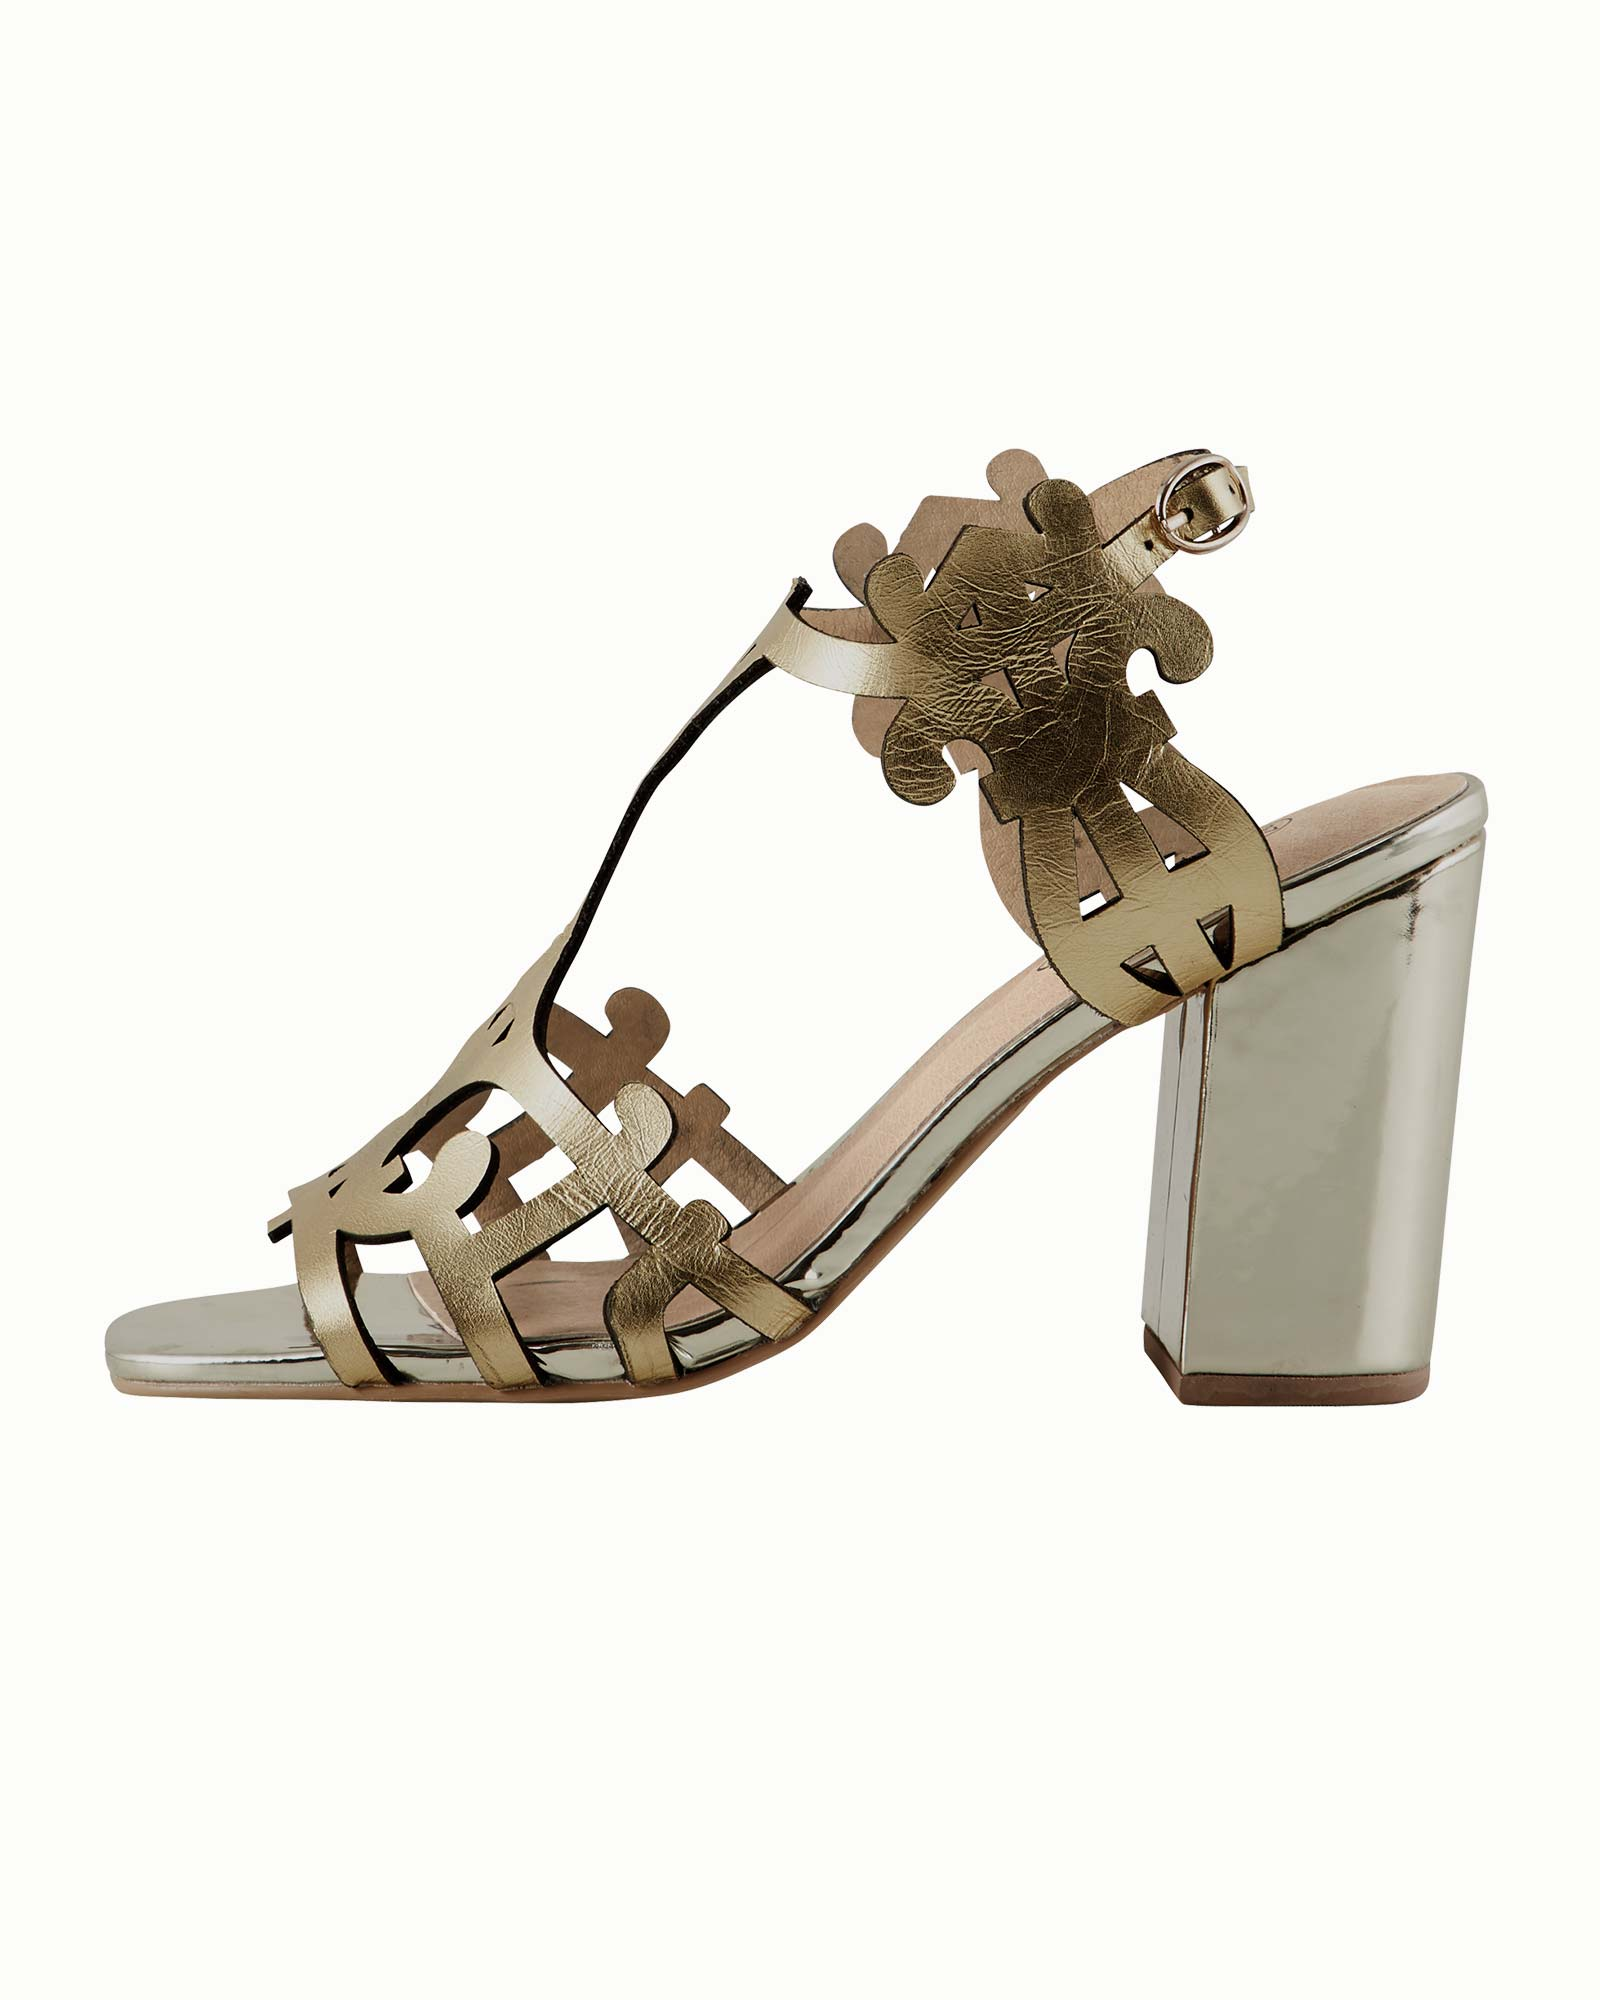 Sandalette mit Muster